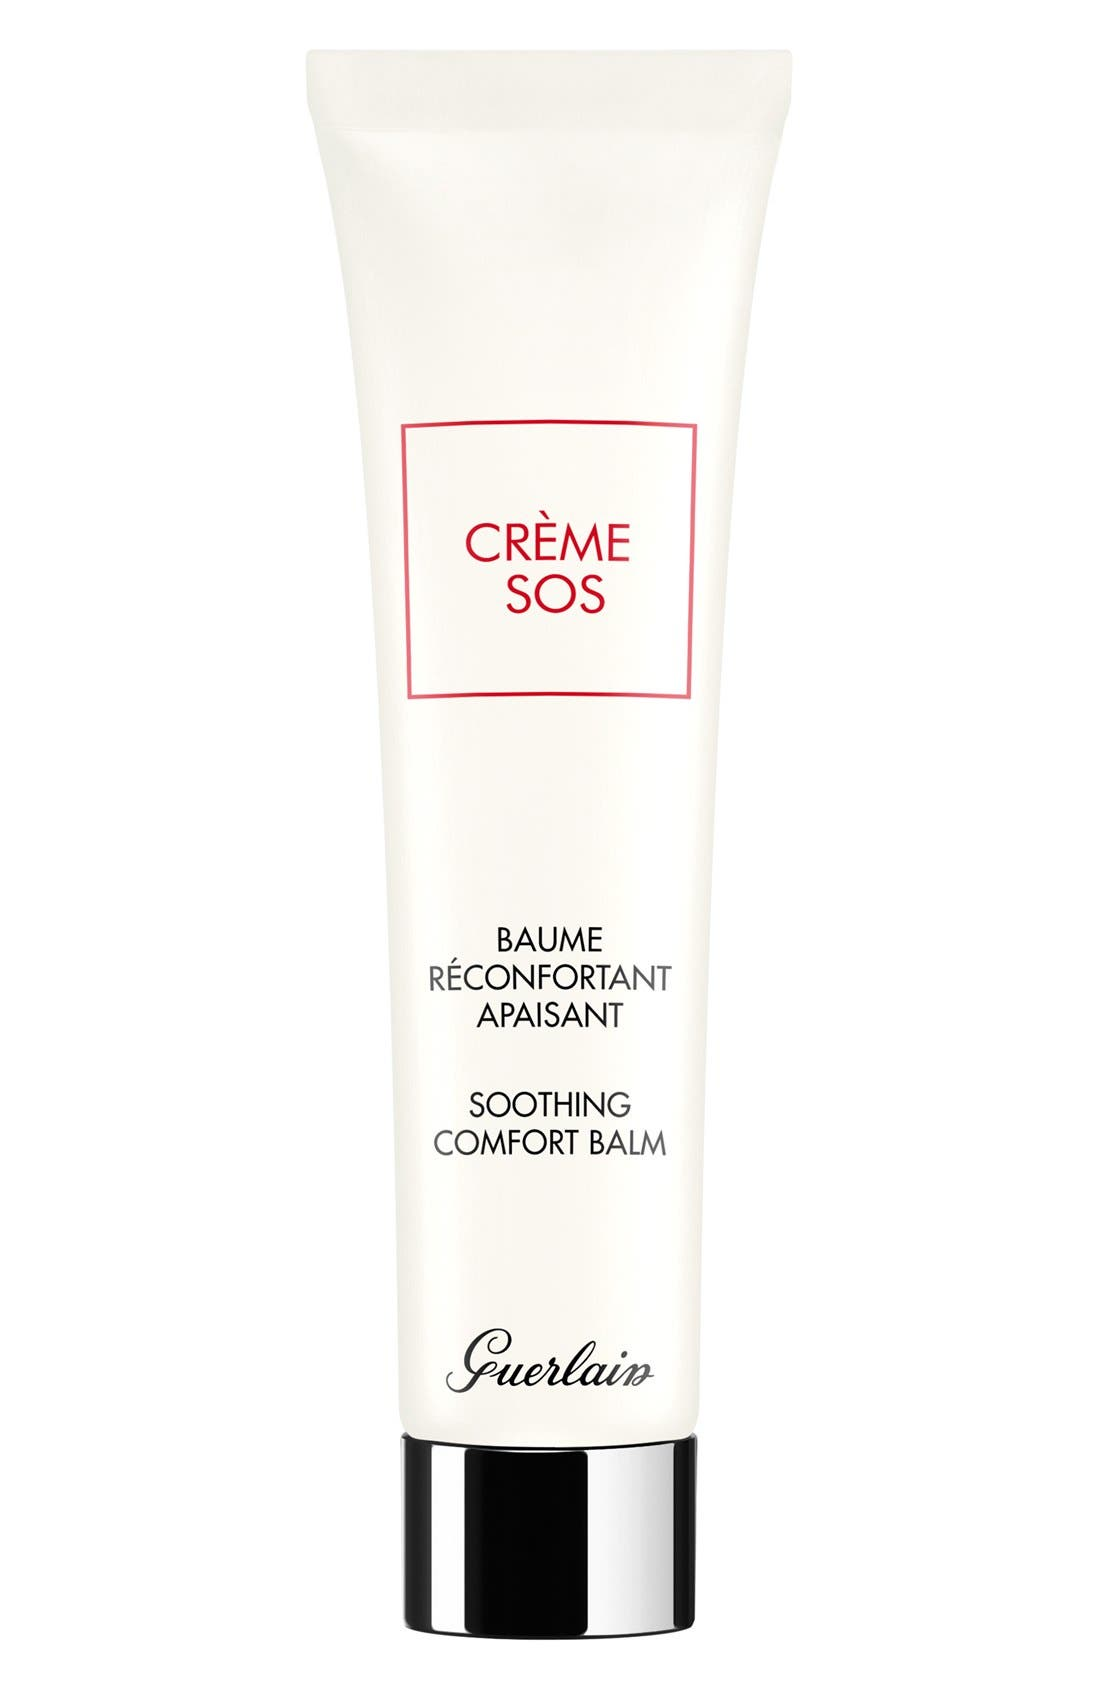 Guerlain 'Crème SOS' Soothing Comfort Balm